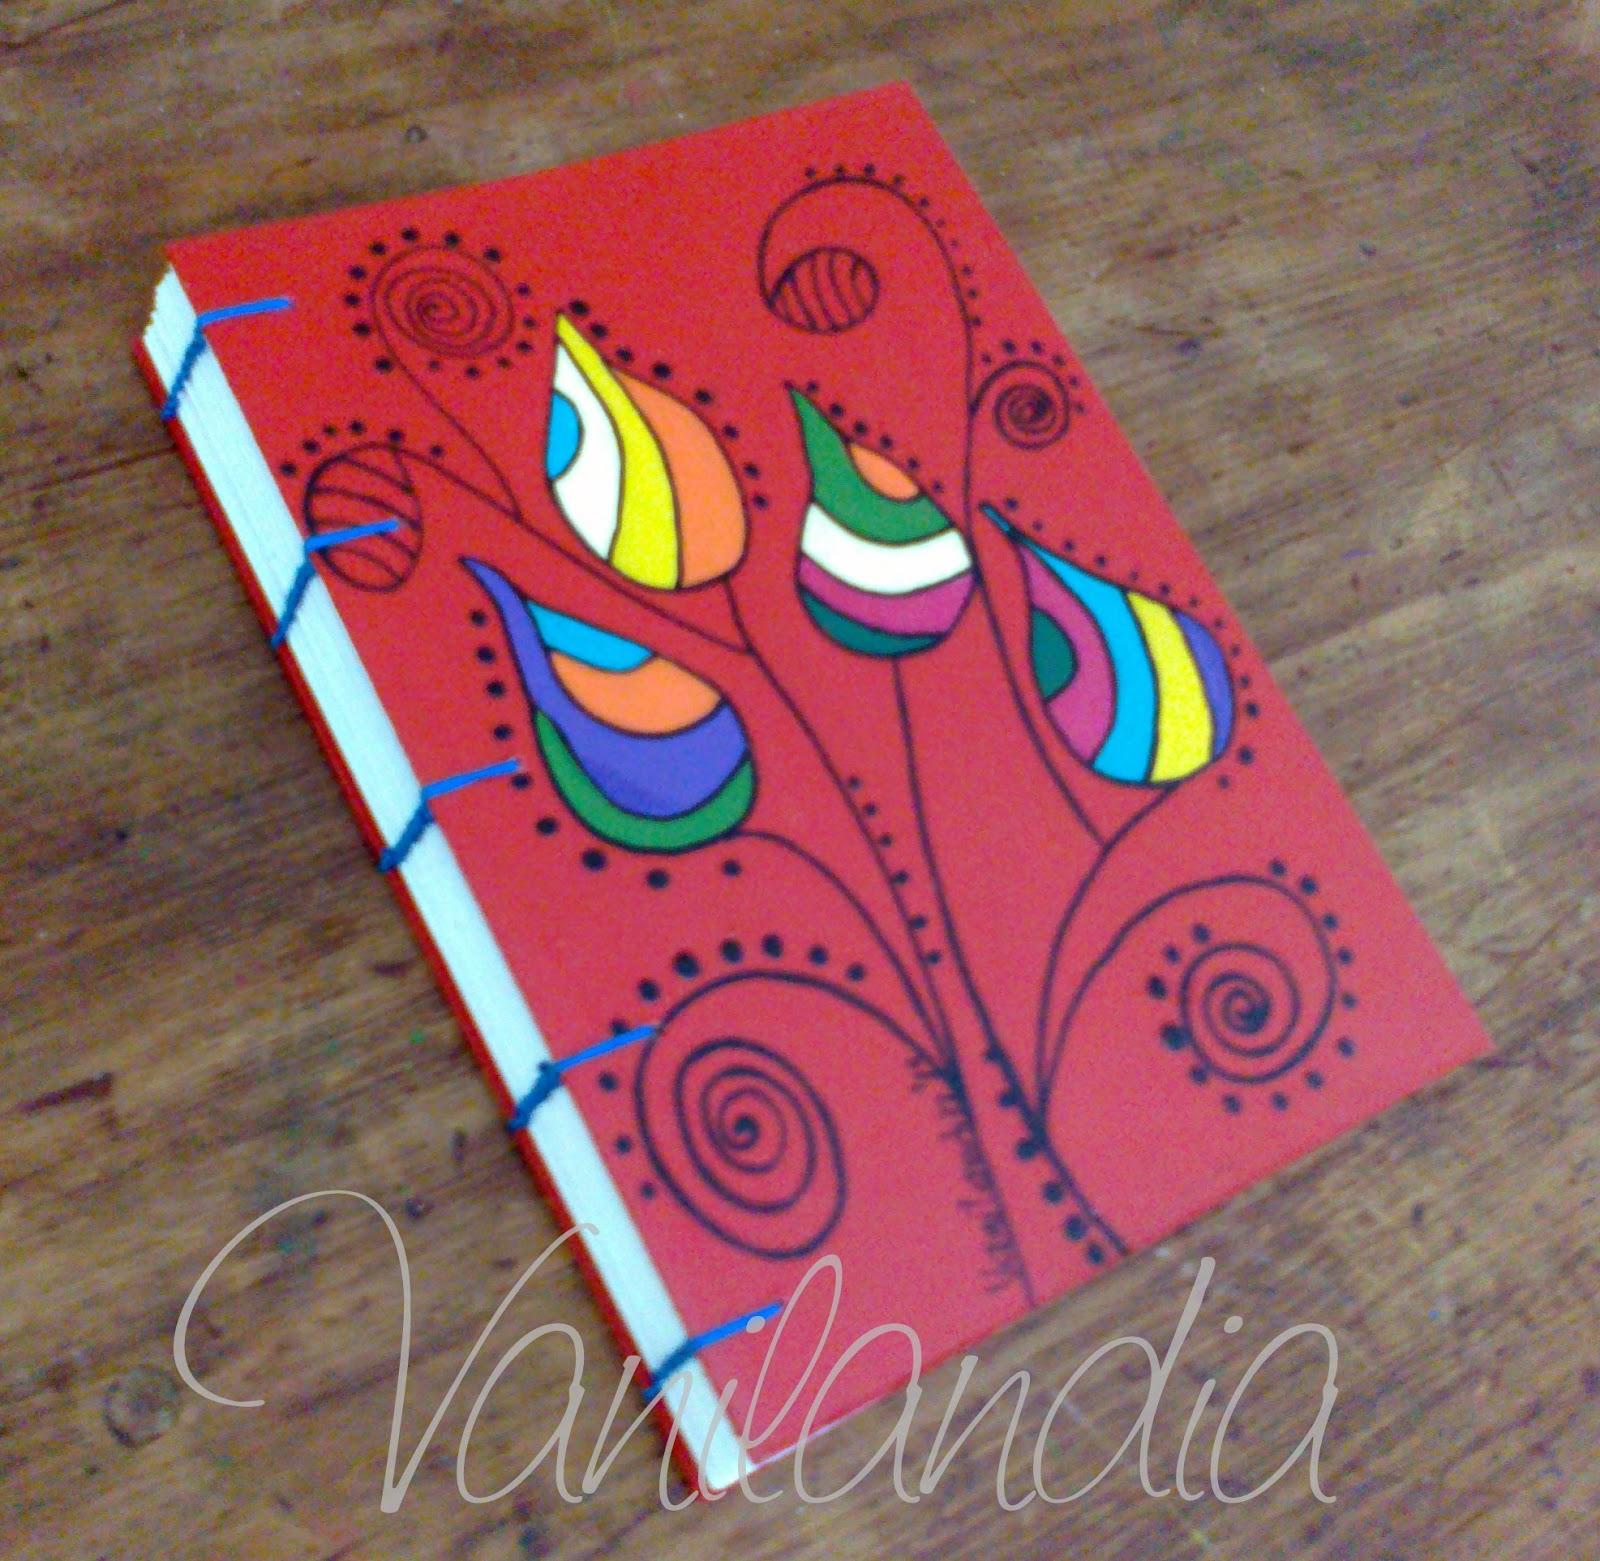 Vanilandia cuadernos - Papel para dibujar ...